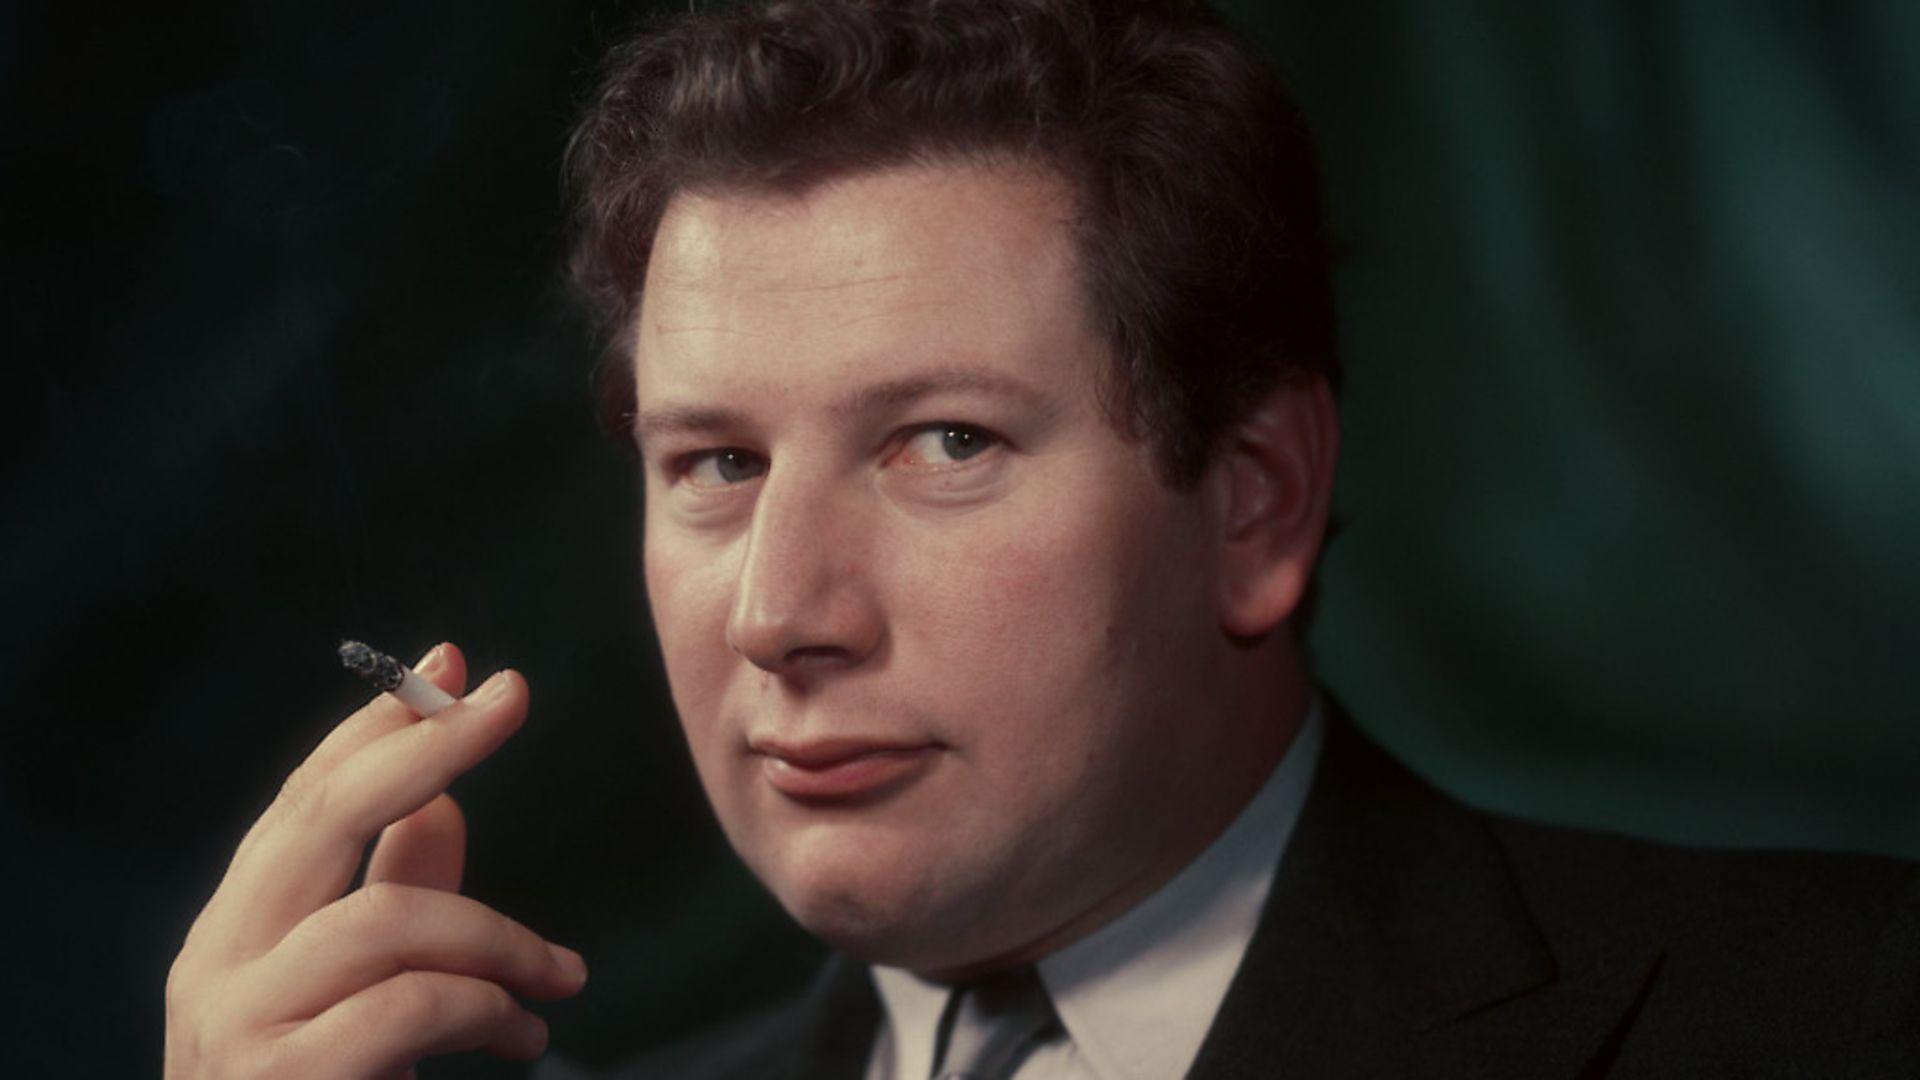 Actor, dramatist and author Peter Ustinov, 1958. Photo: � Hulton-Deutsch Collection/CORBIS/Corbis via Getty Images - Credit: Corbis via Getty Images